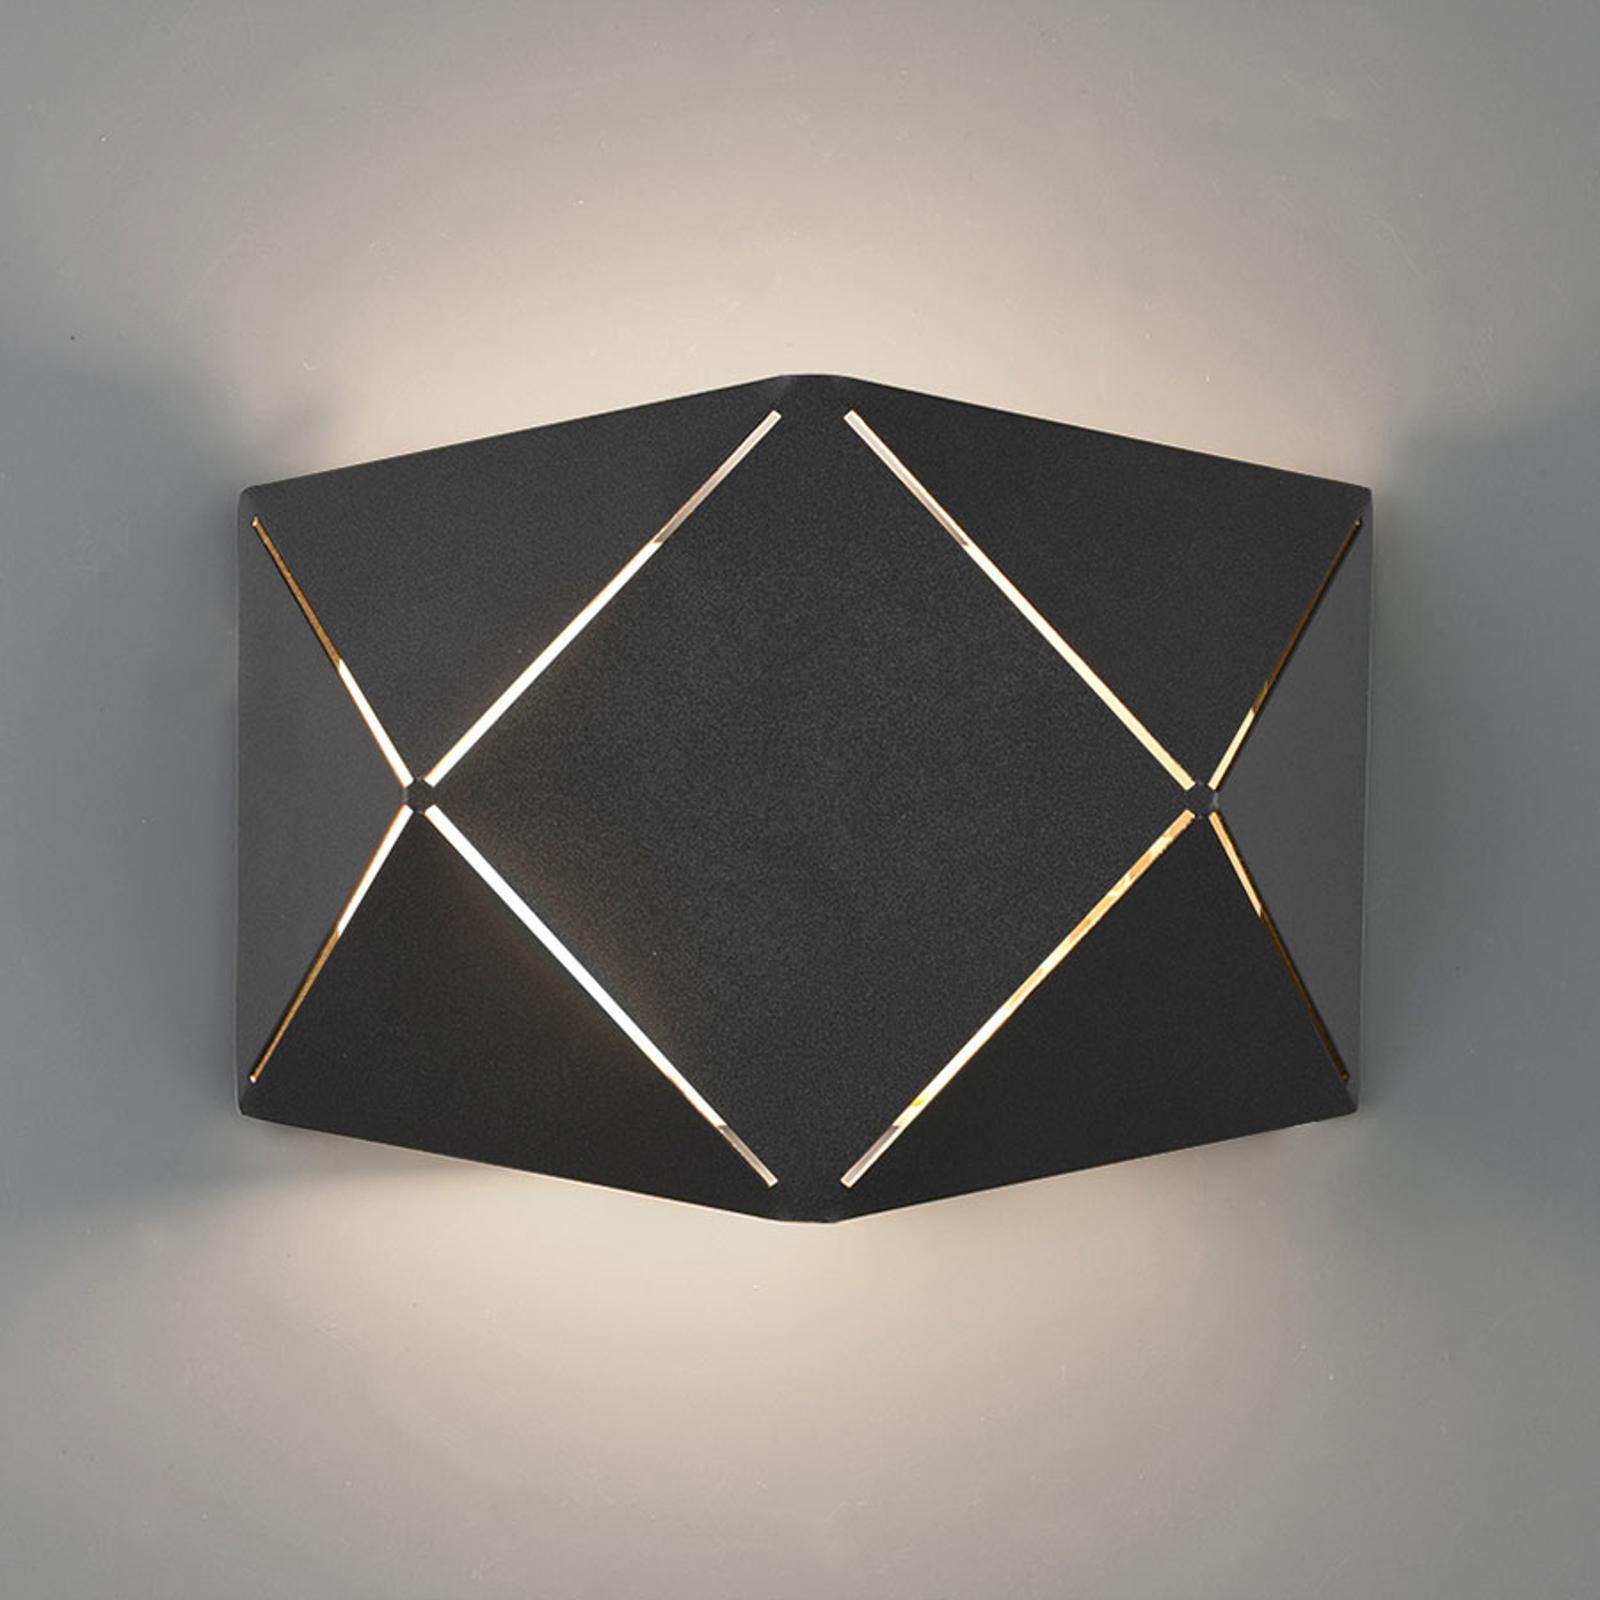 LED wandlamp Zandor in zwart, breedte 18 cm